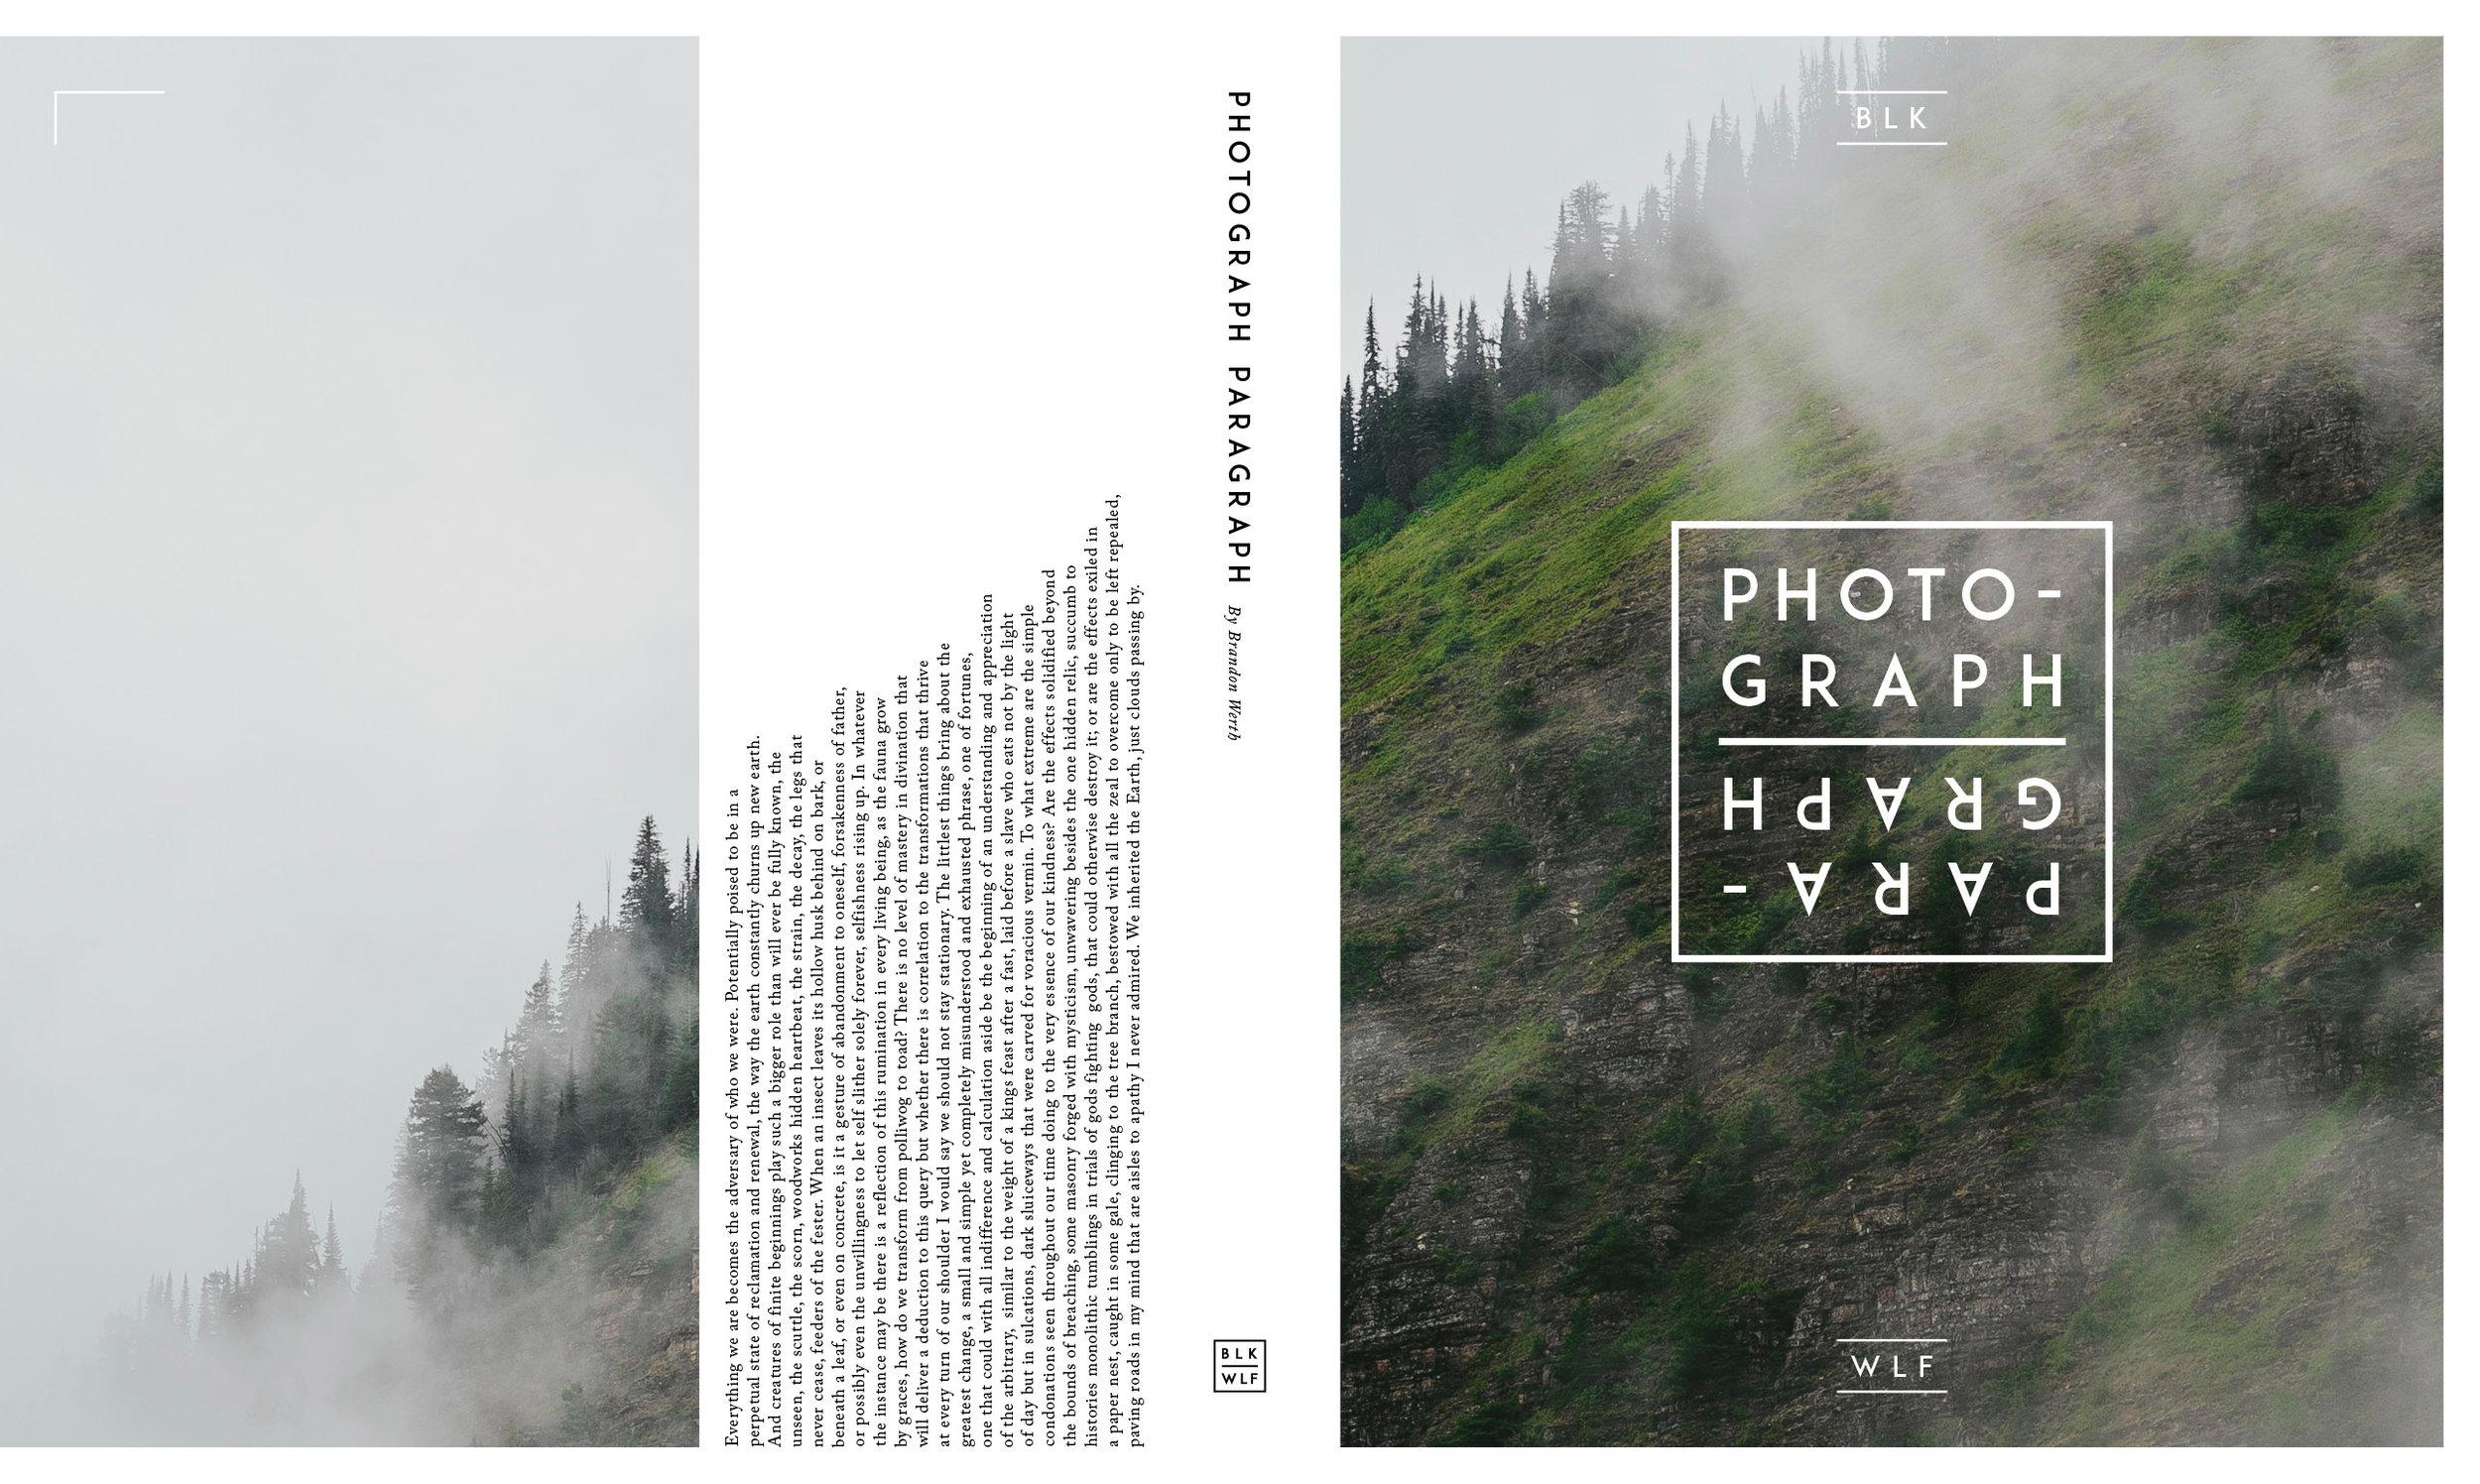 photograph.paragraph_cover_v2.jpg